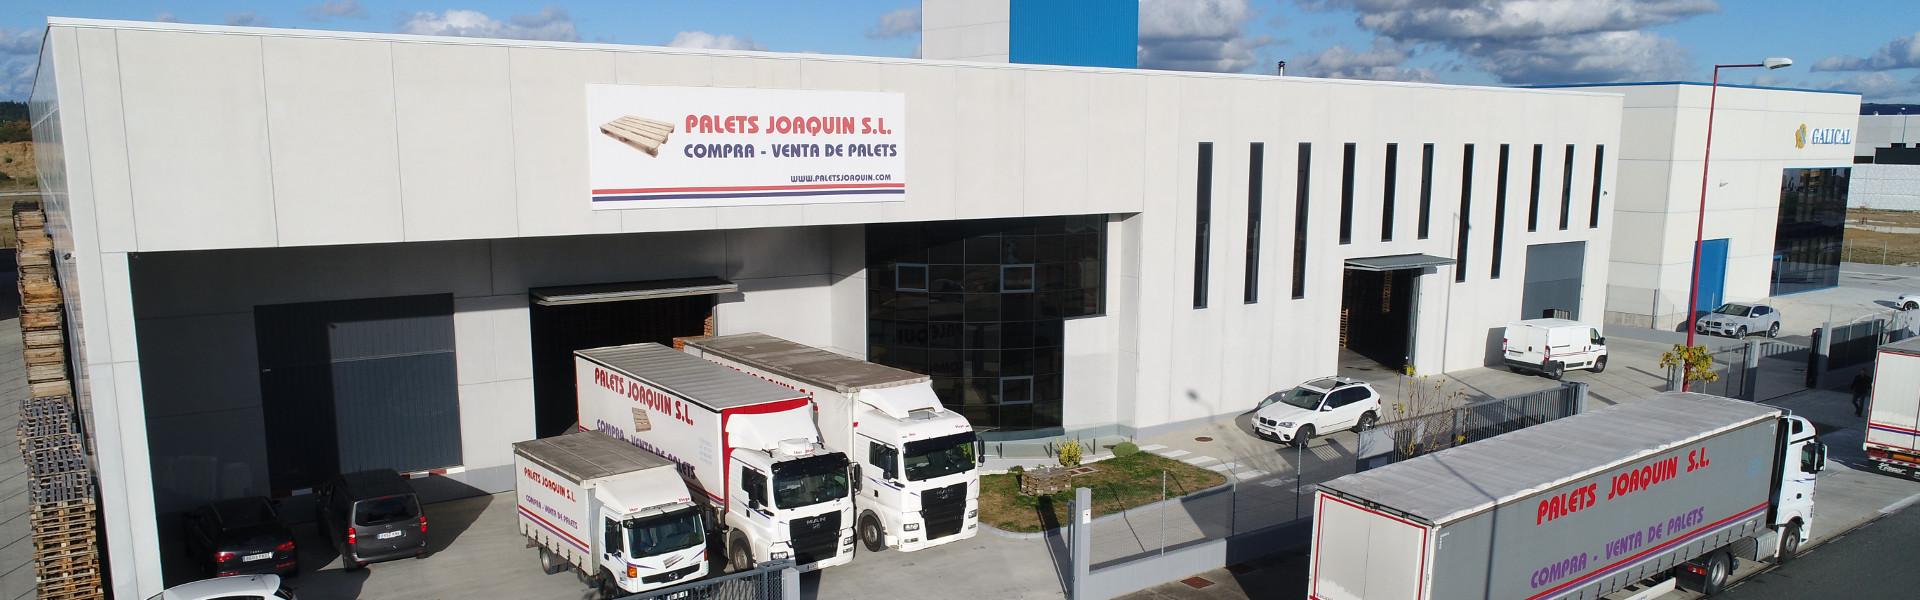 palets-joaquin-slide-04